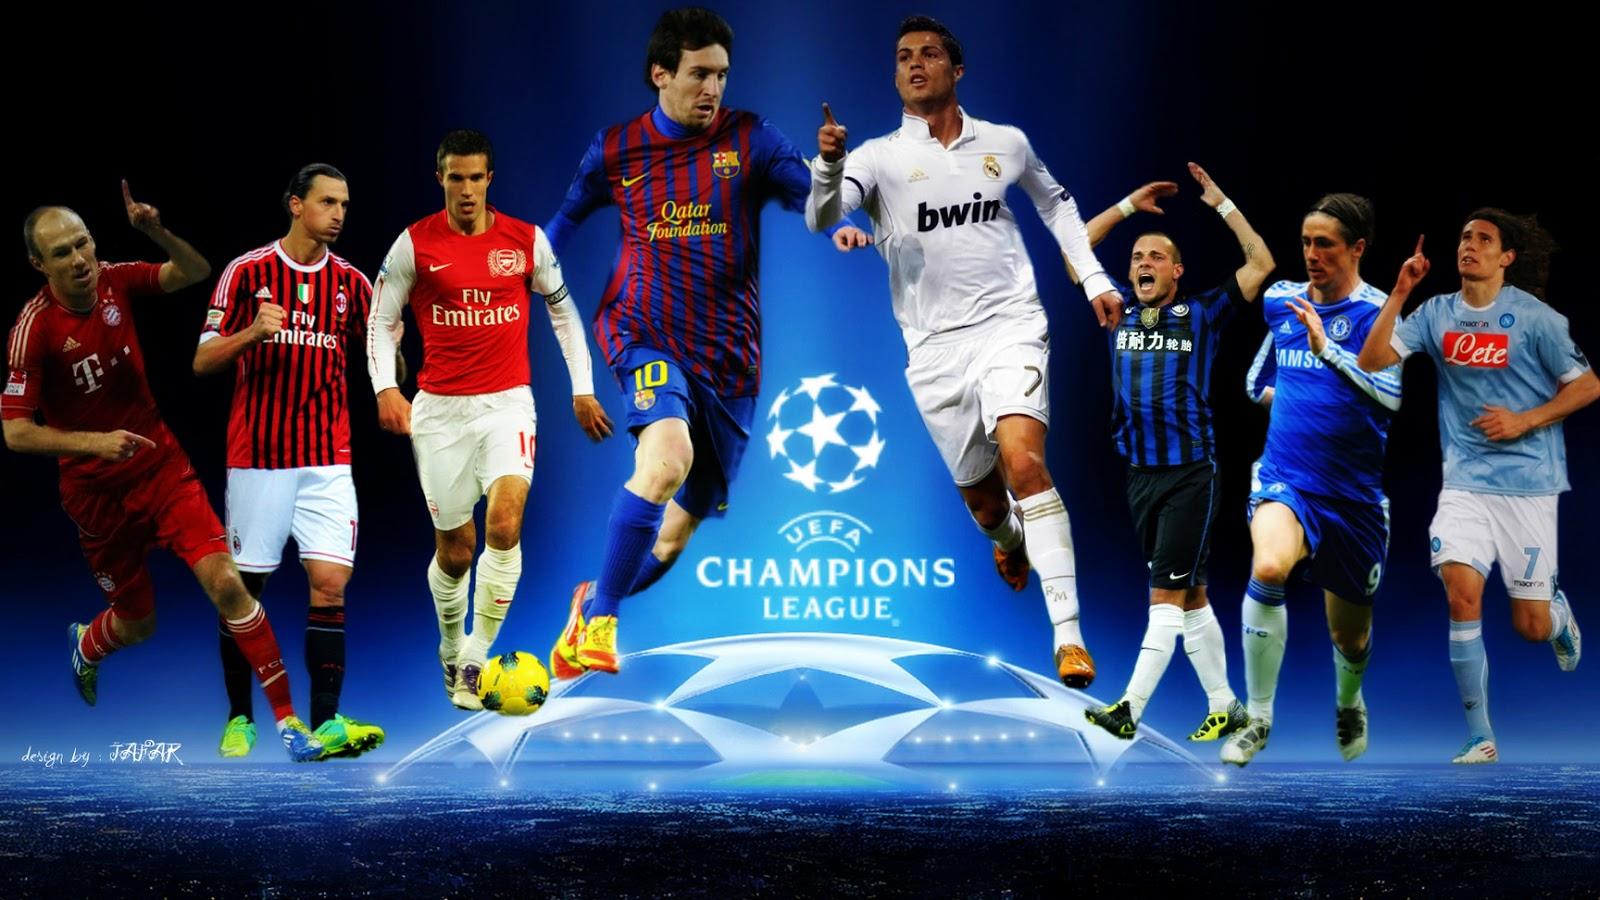 Football Players Wallpaper Free Download Champions League Wallpaper Hd 1280x800